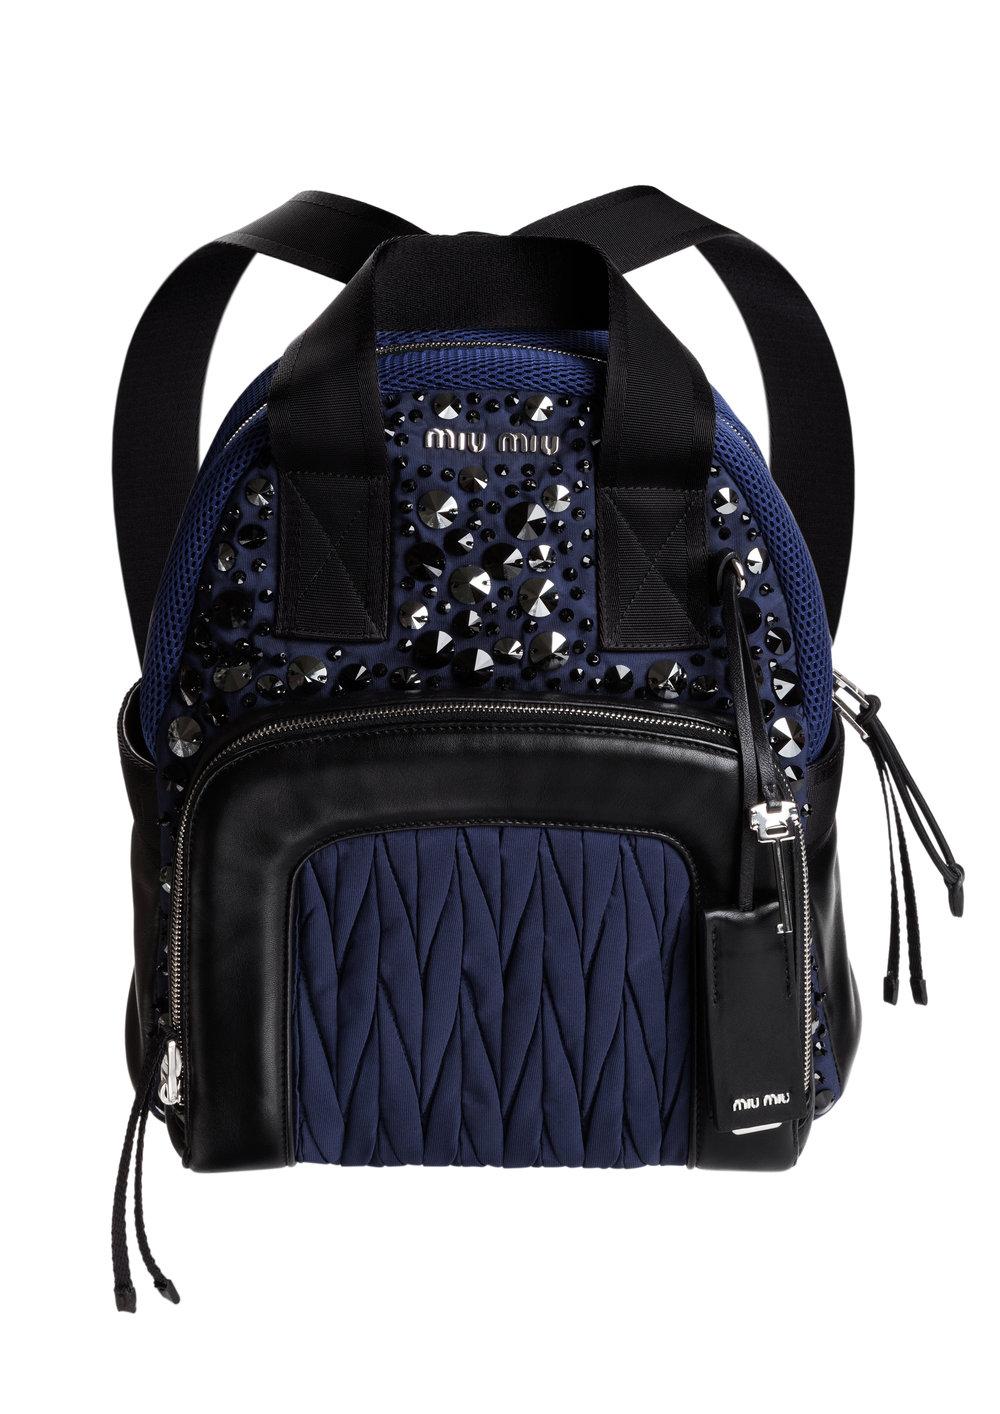 miumiu-backpack-blue.jpg